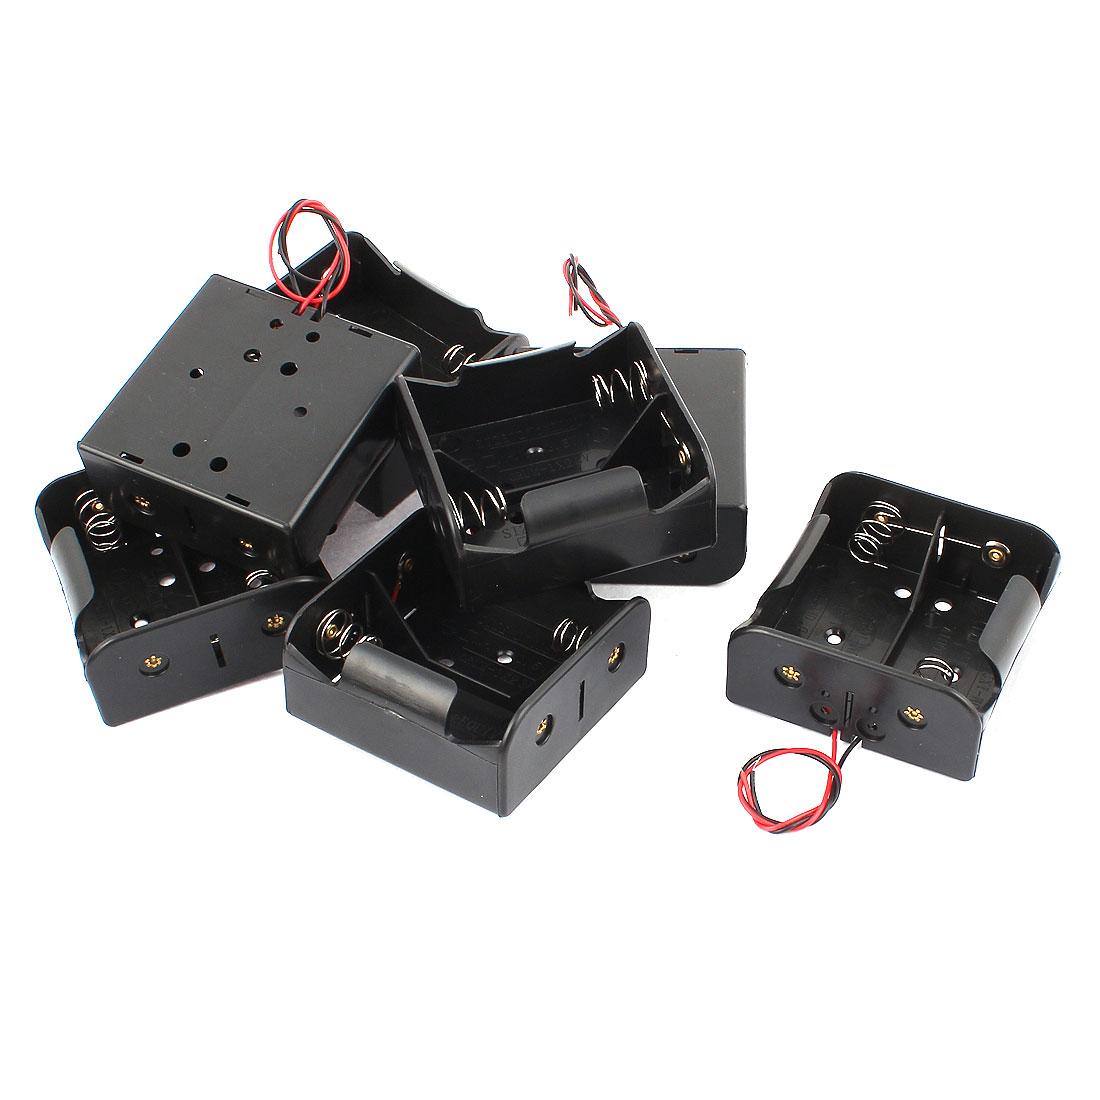 7 Pcs Black Plastic 1.5V D Size Battery Cell Case Holder Battery Case